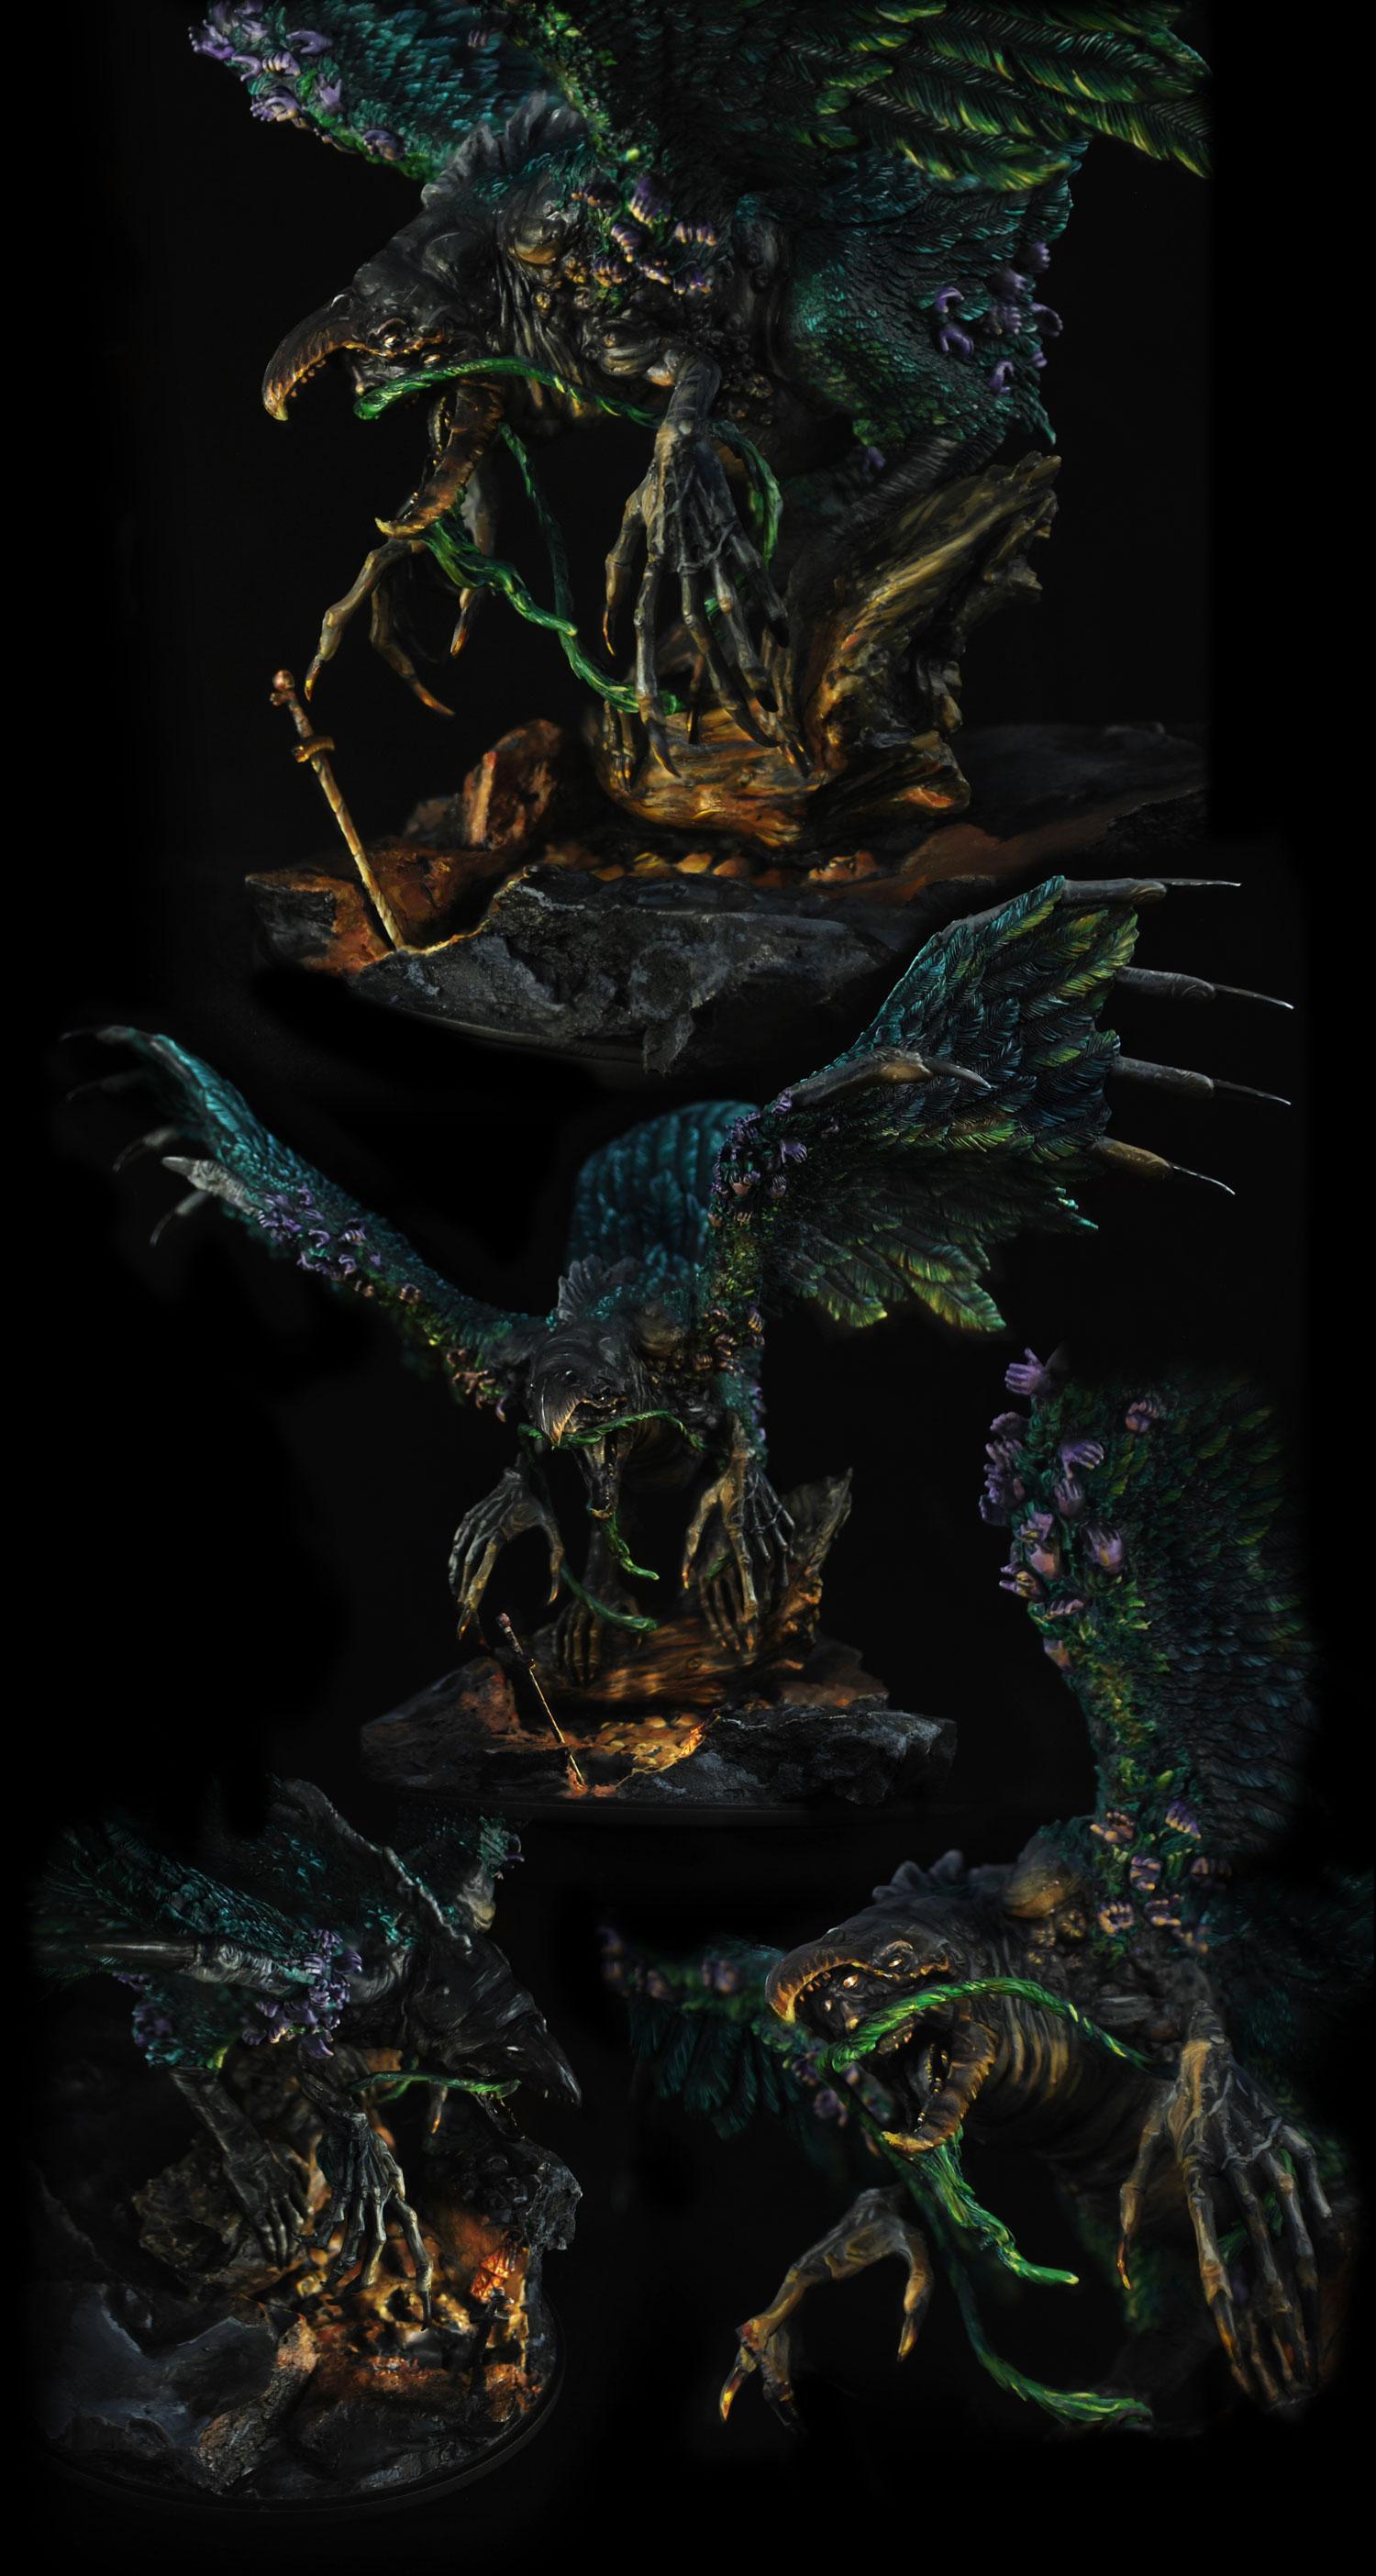 Bird, Competition, Display, Kingdom Death, Monster, Non-Metallic Metal, Object Source Lighting, Phoenix, Teal